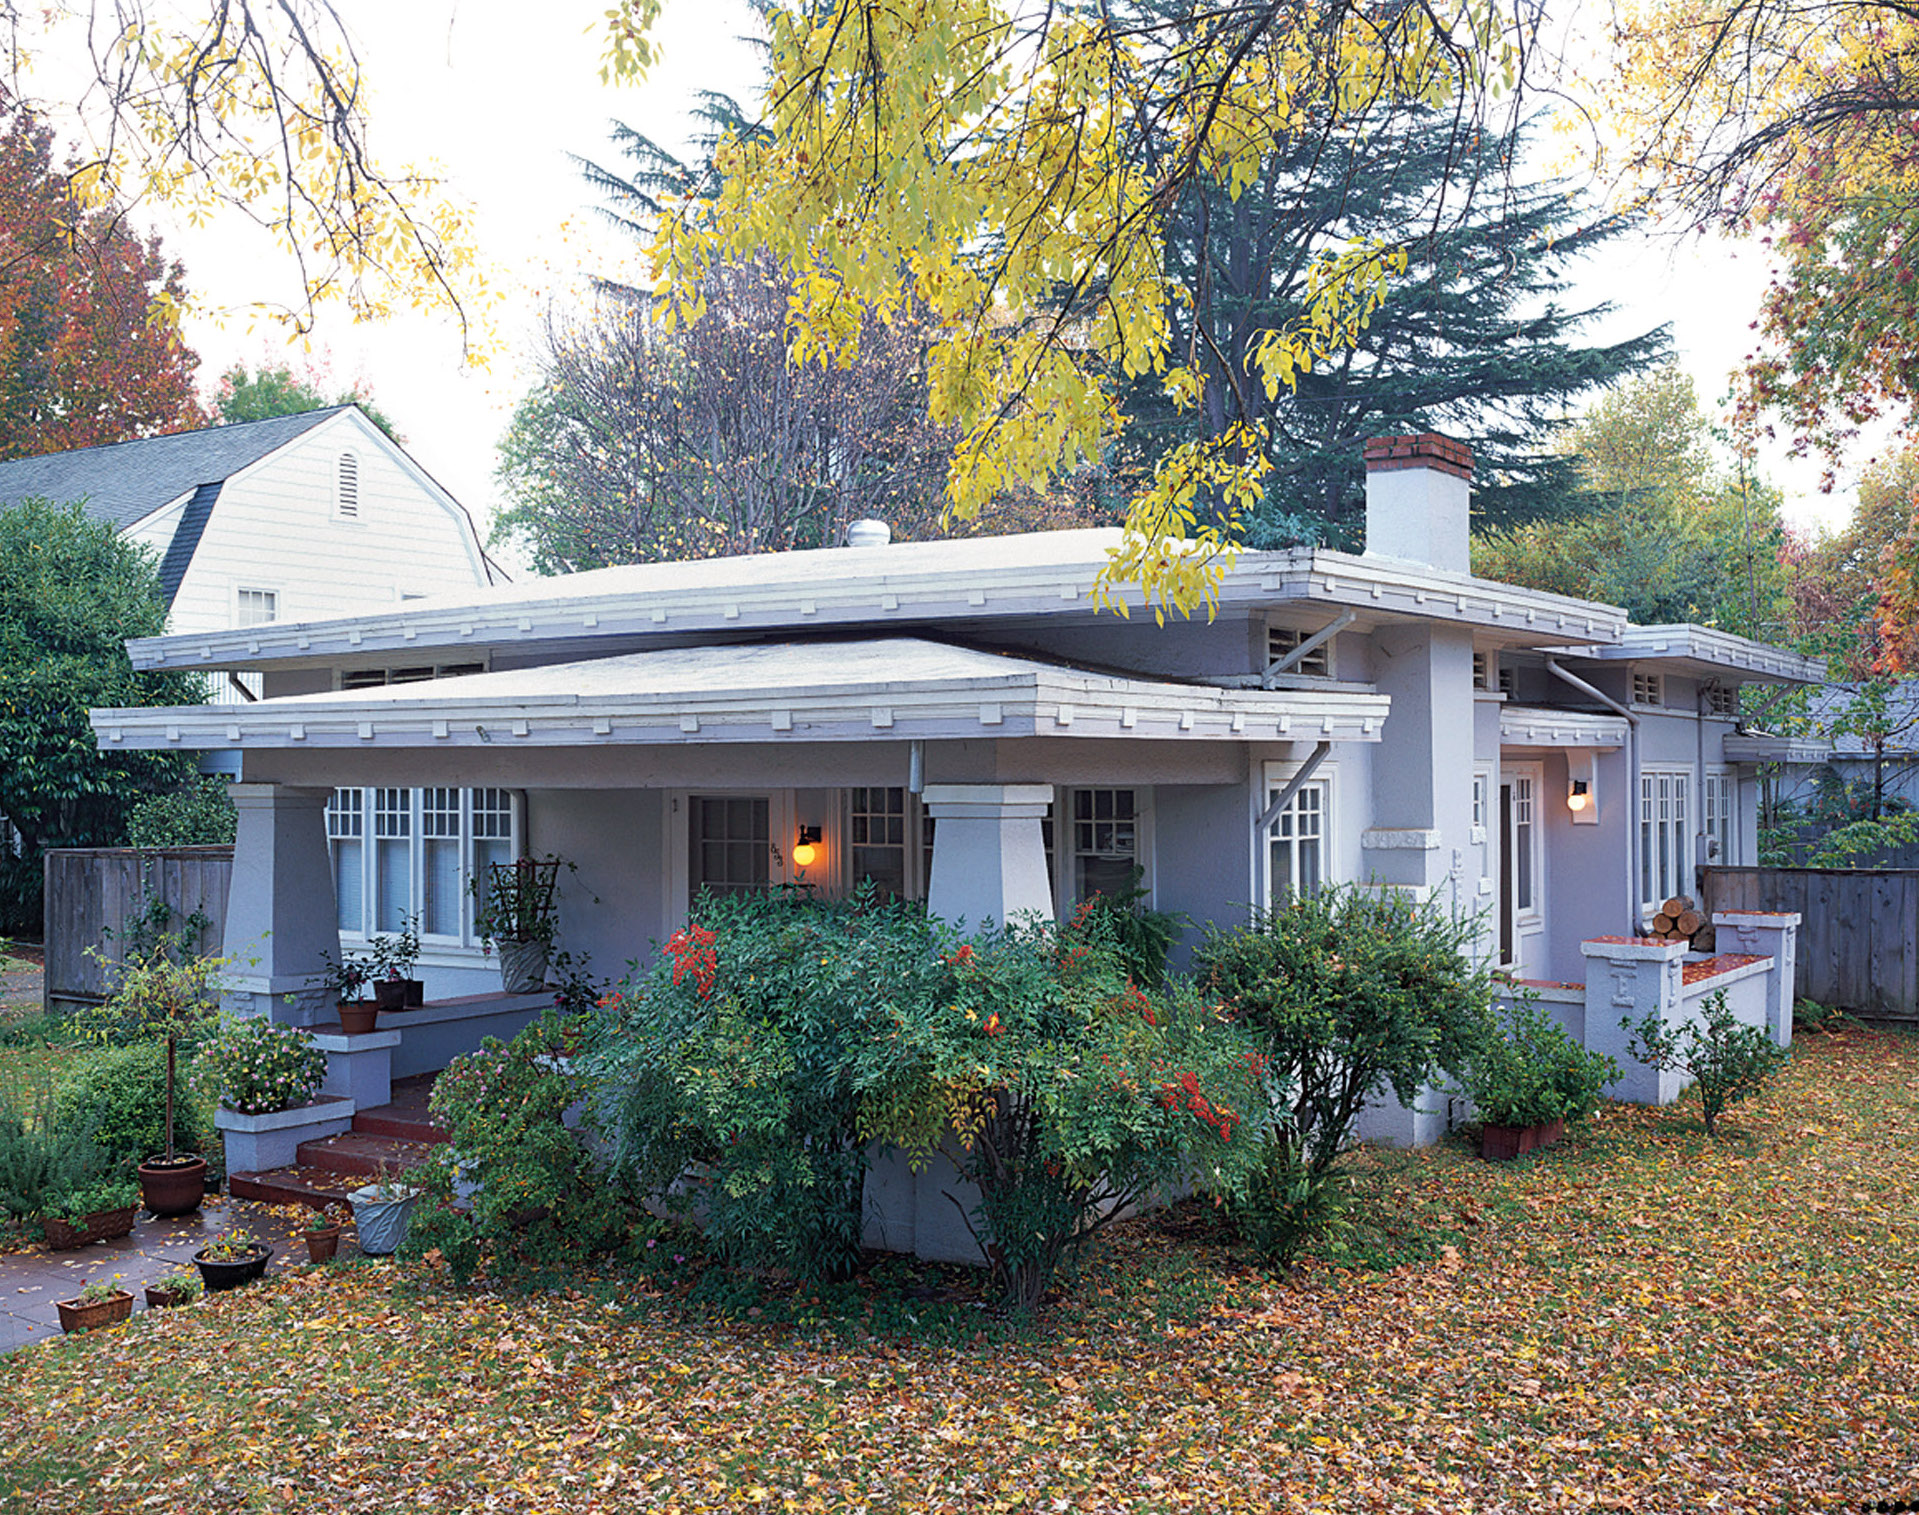 S3 prairie bungalow